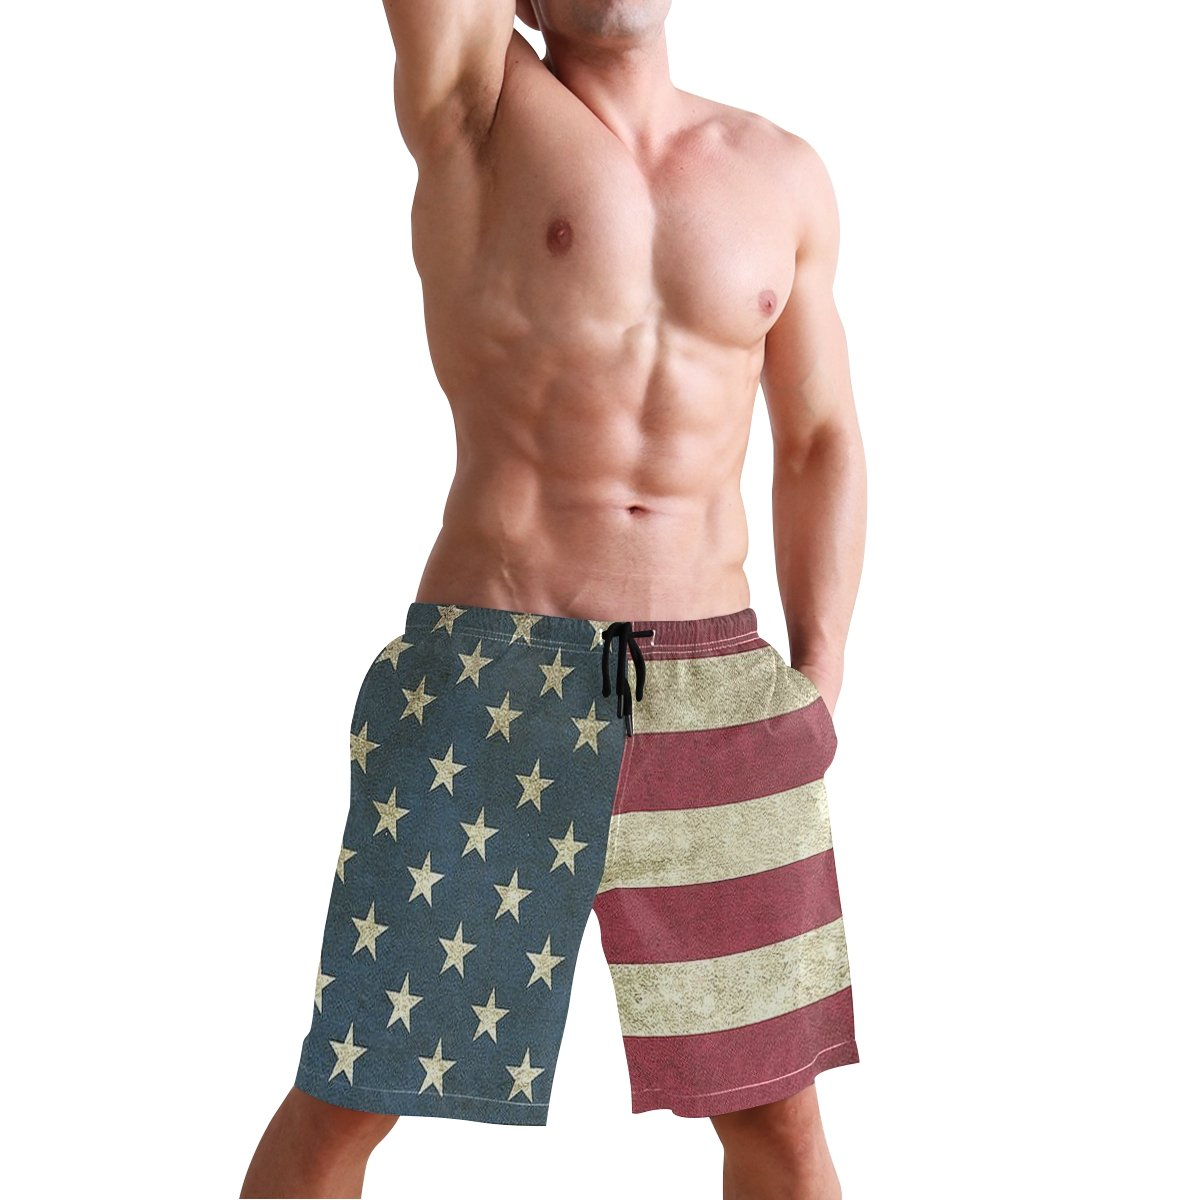 Vintage American Flag Mens Swim Trunks Quick Dry Beach Board Shorts with Drawstring Pocket